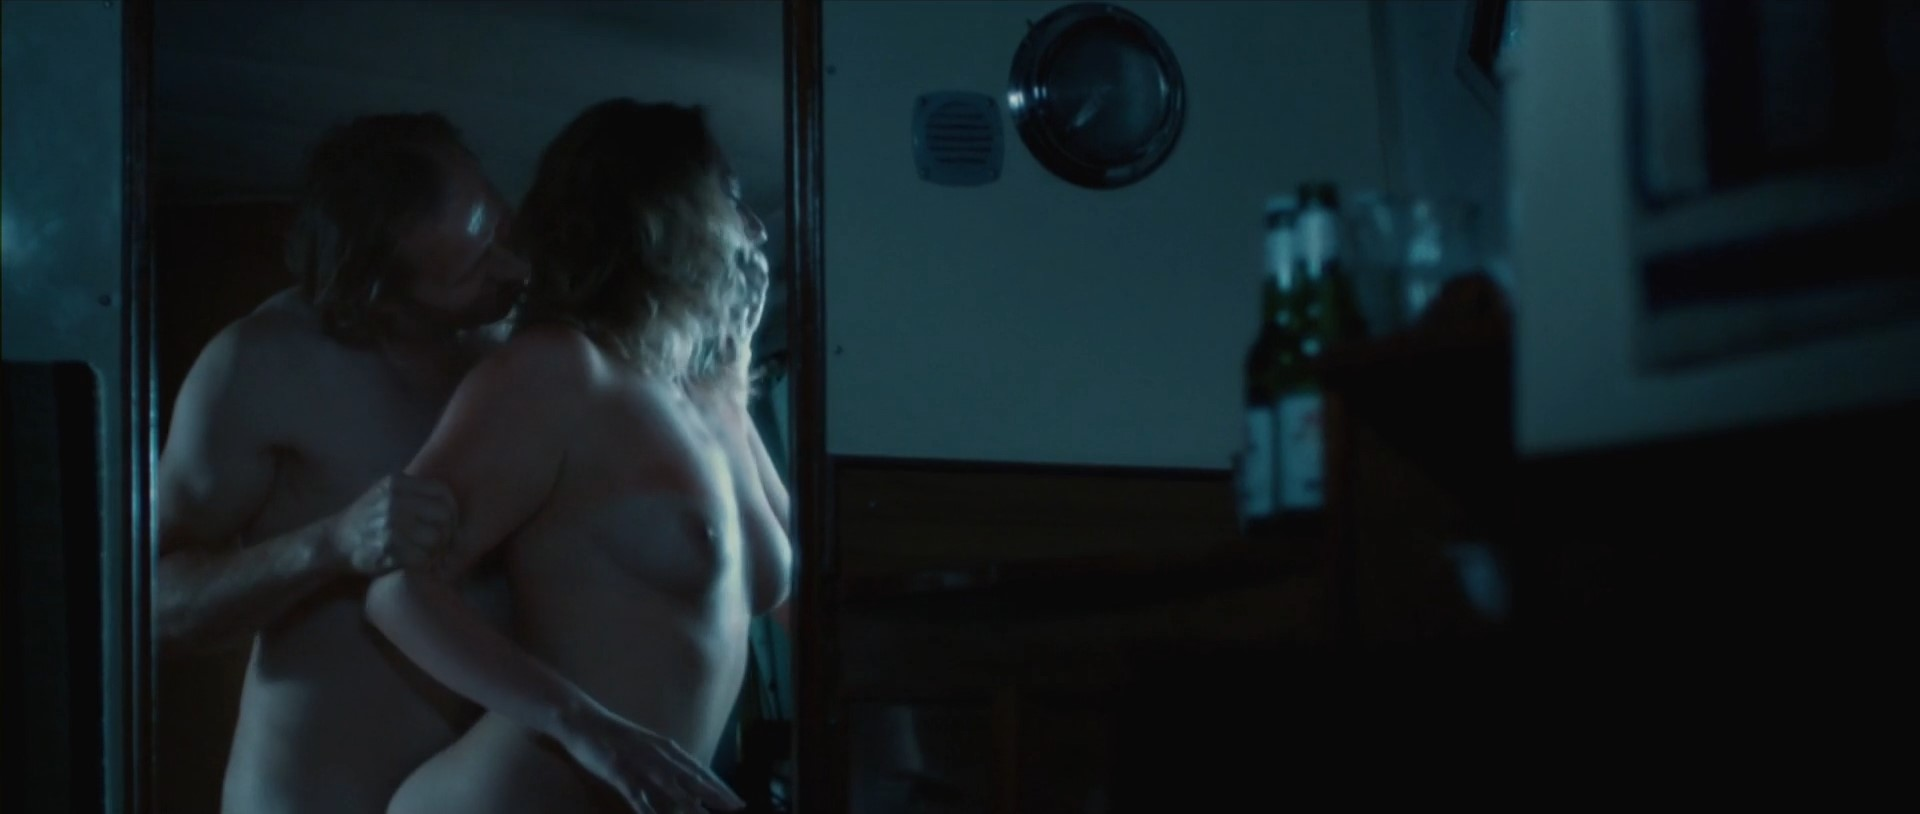 Excalibur Movie Sex Scene watch online - lucy challenger, helen barford – jam today